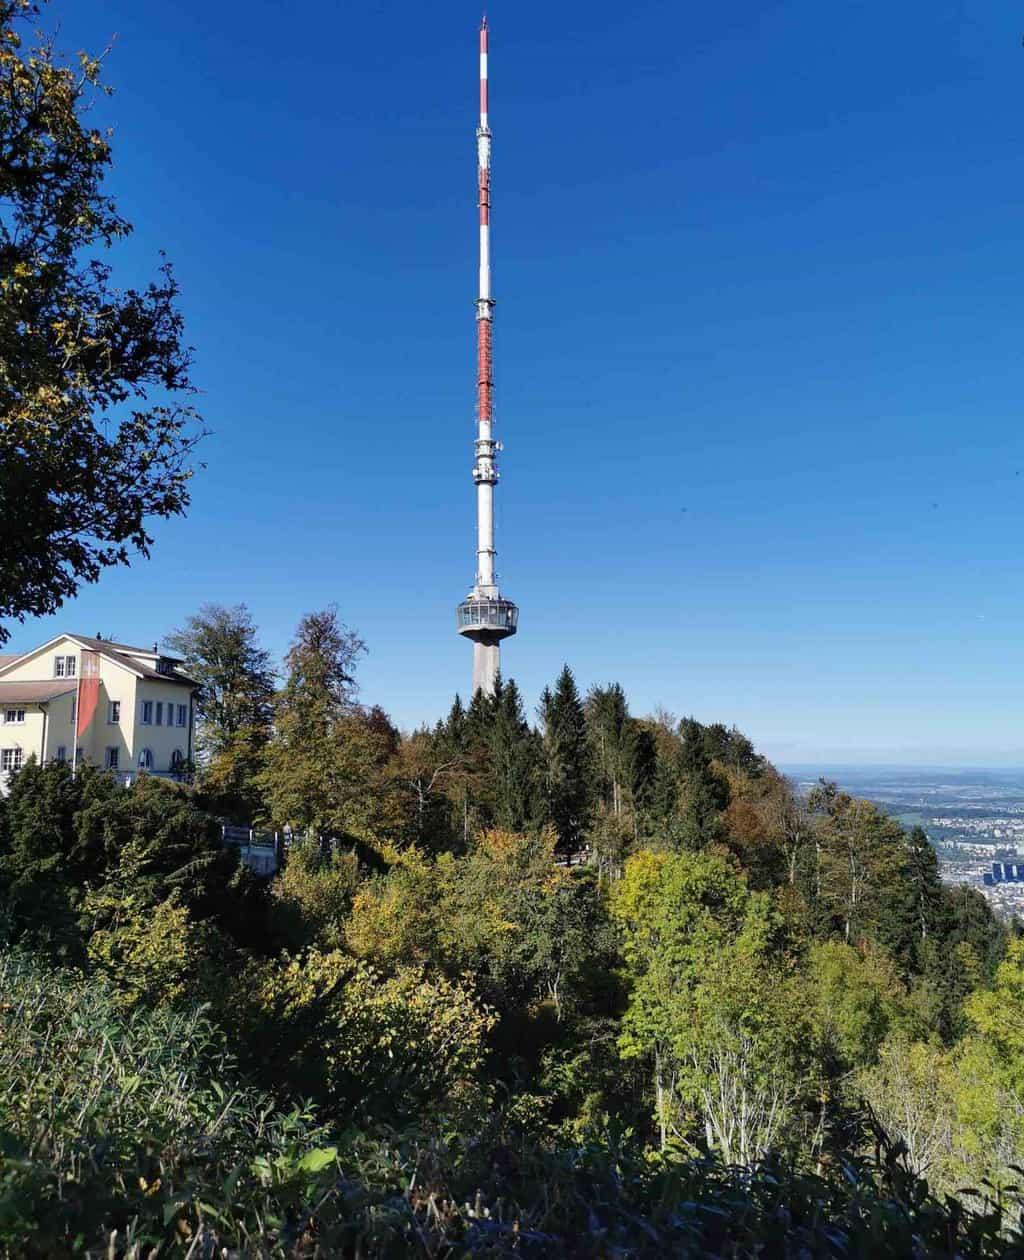 Hiking in Zurich from Uetliberg along the Felsenegg Ridge